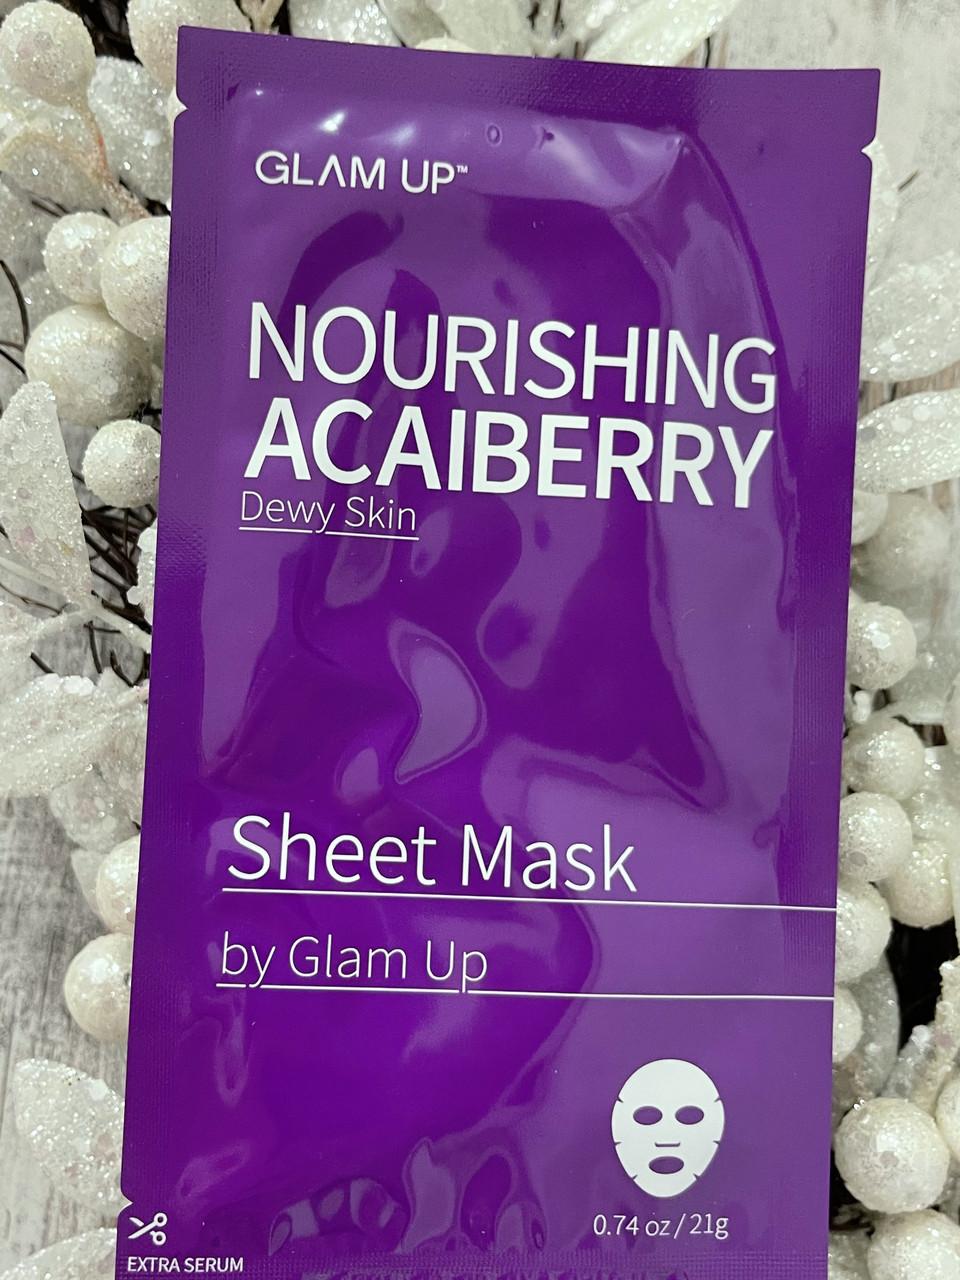 Увлажняющая тканевая маска для лица GLAM UP Nourishing Acaiberry